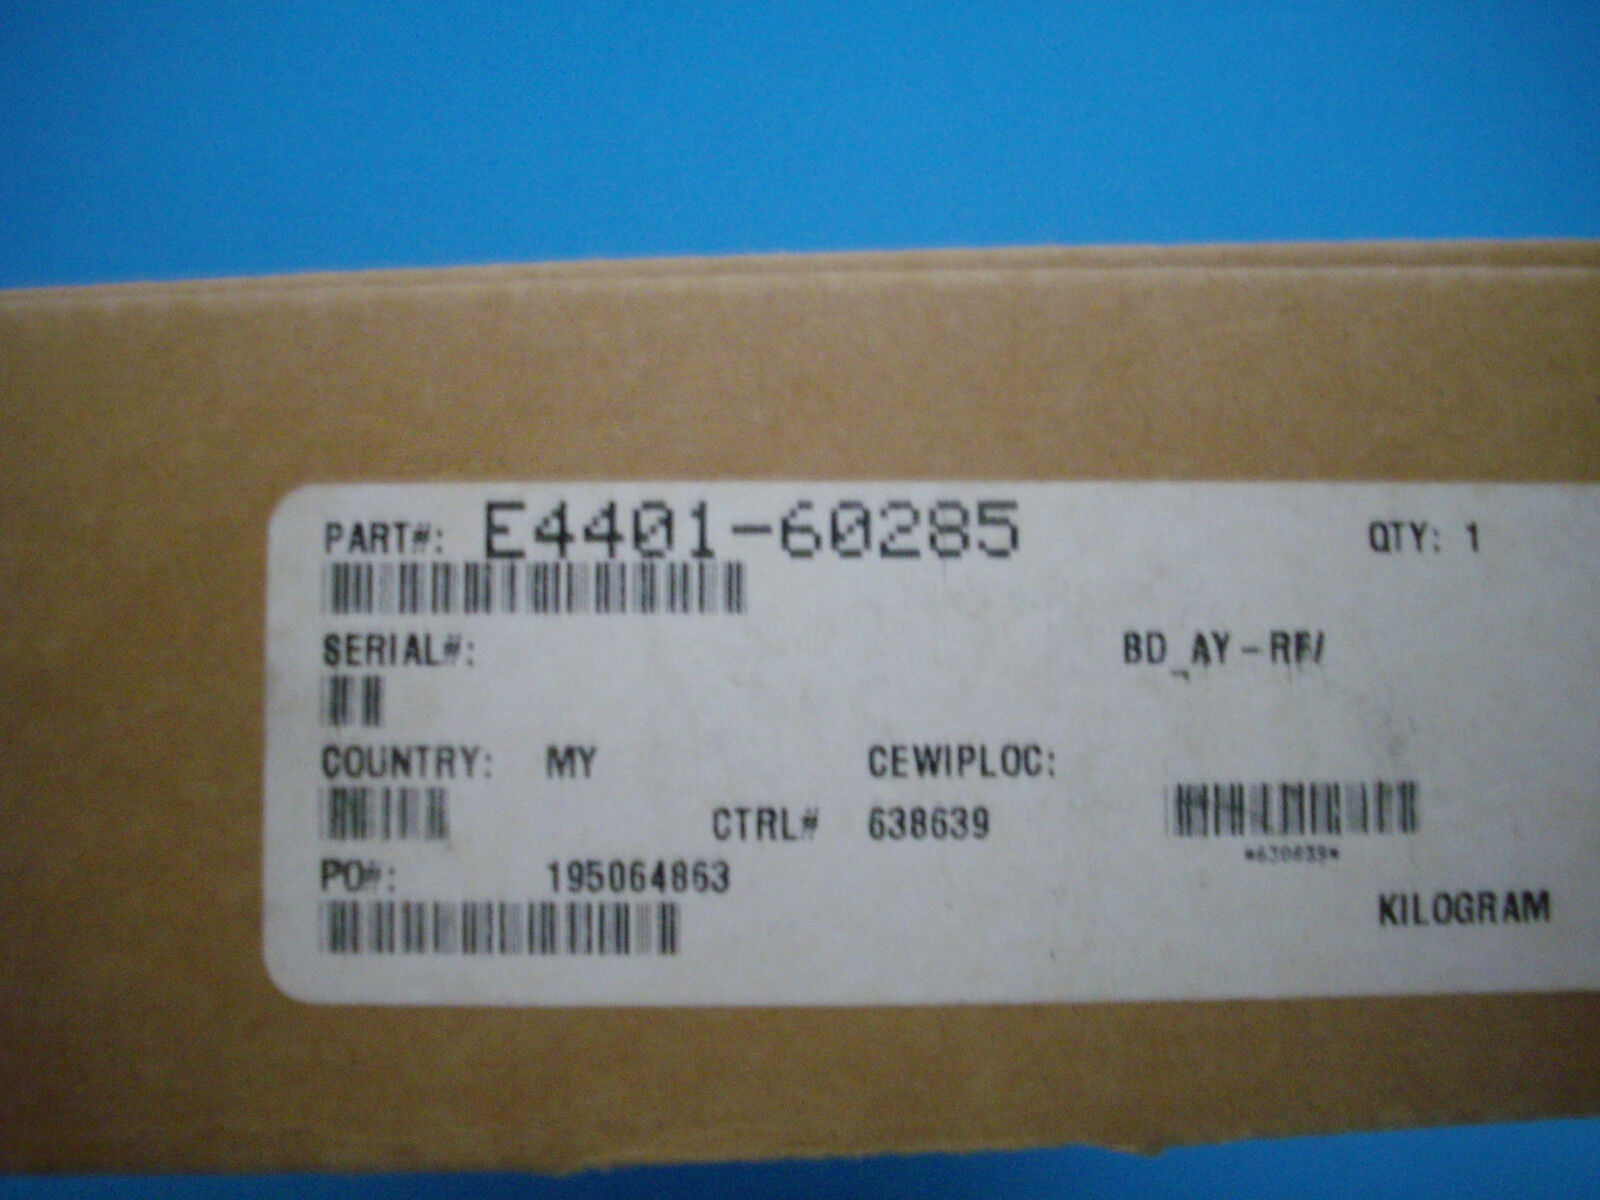 Agilent E4401-60285 A7A8 Digital Demod RF Assy x ESA series Spectrum Analyzers